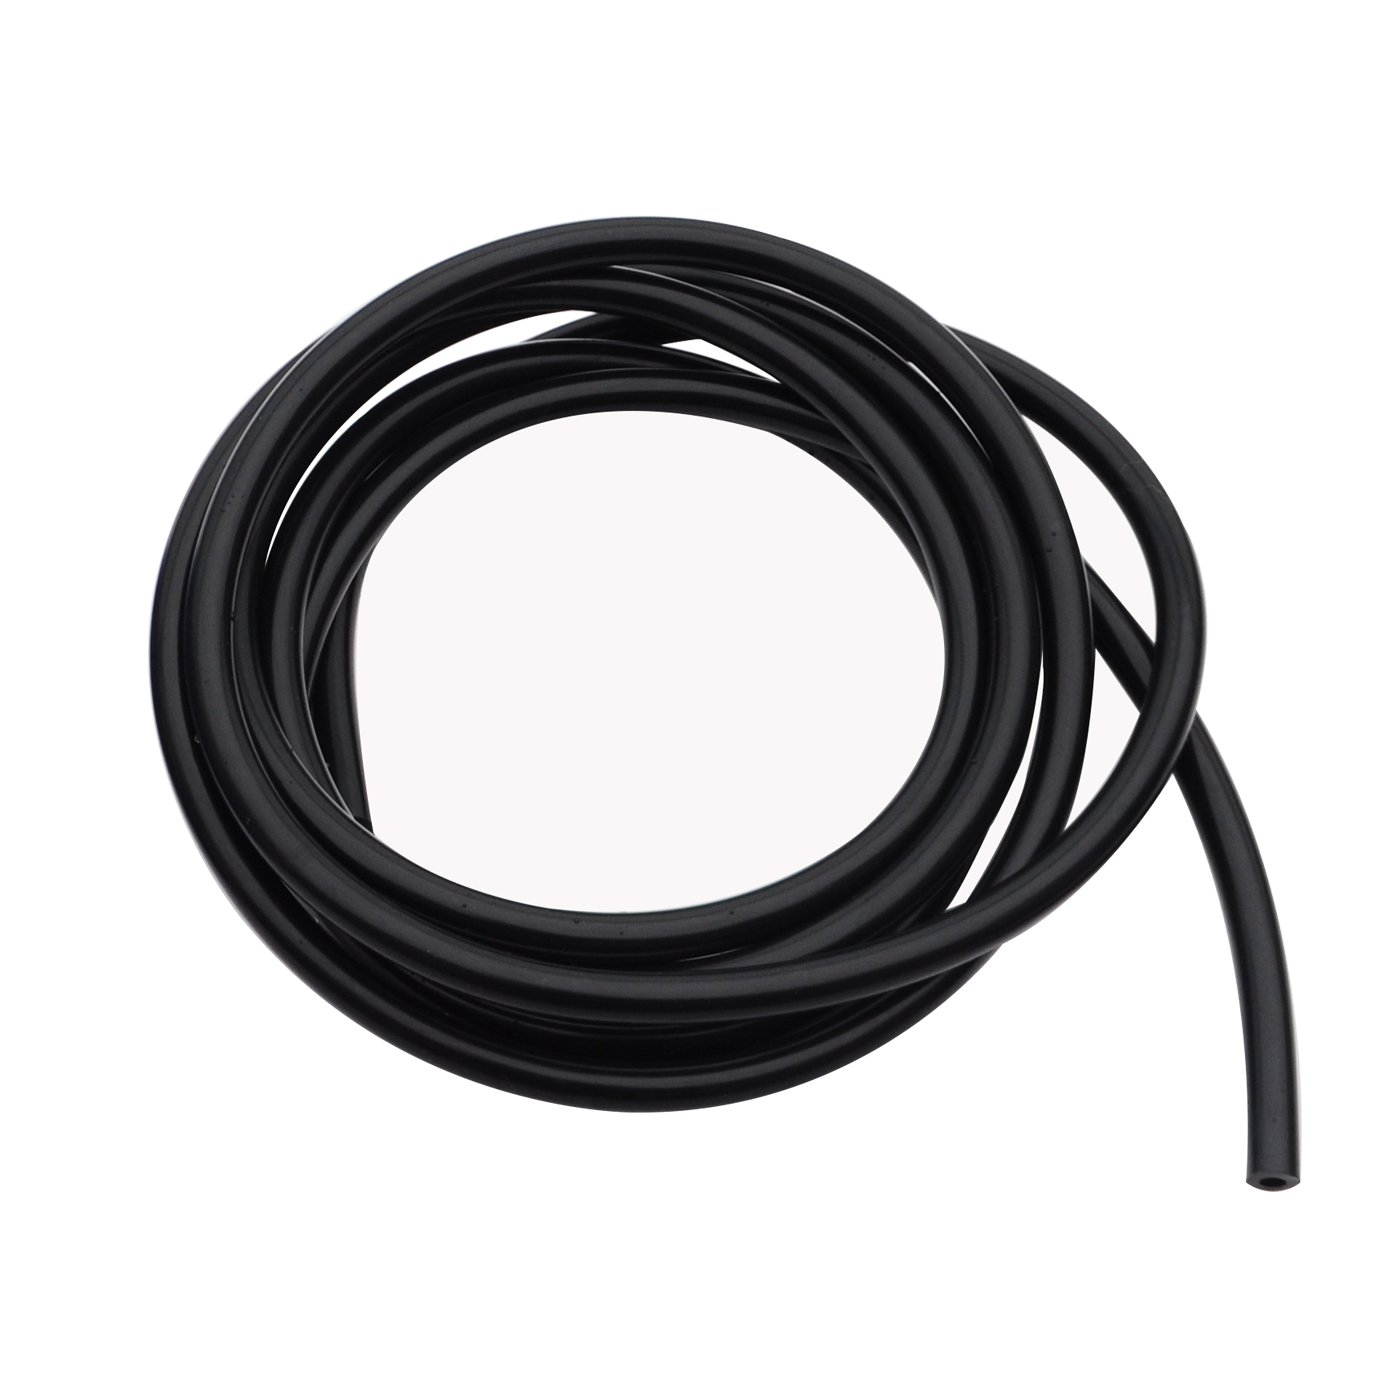 "High Performance Silicone Vacuum Tubing Hose, ID 0.16"" (4mm), OD 0.35"" (9mm), 10 Feet per roll (3 Meter), Black 60 psi Maxium Pressure"